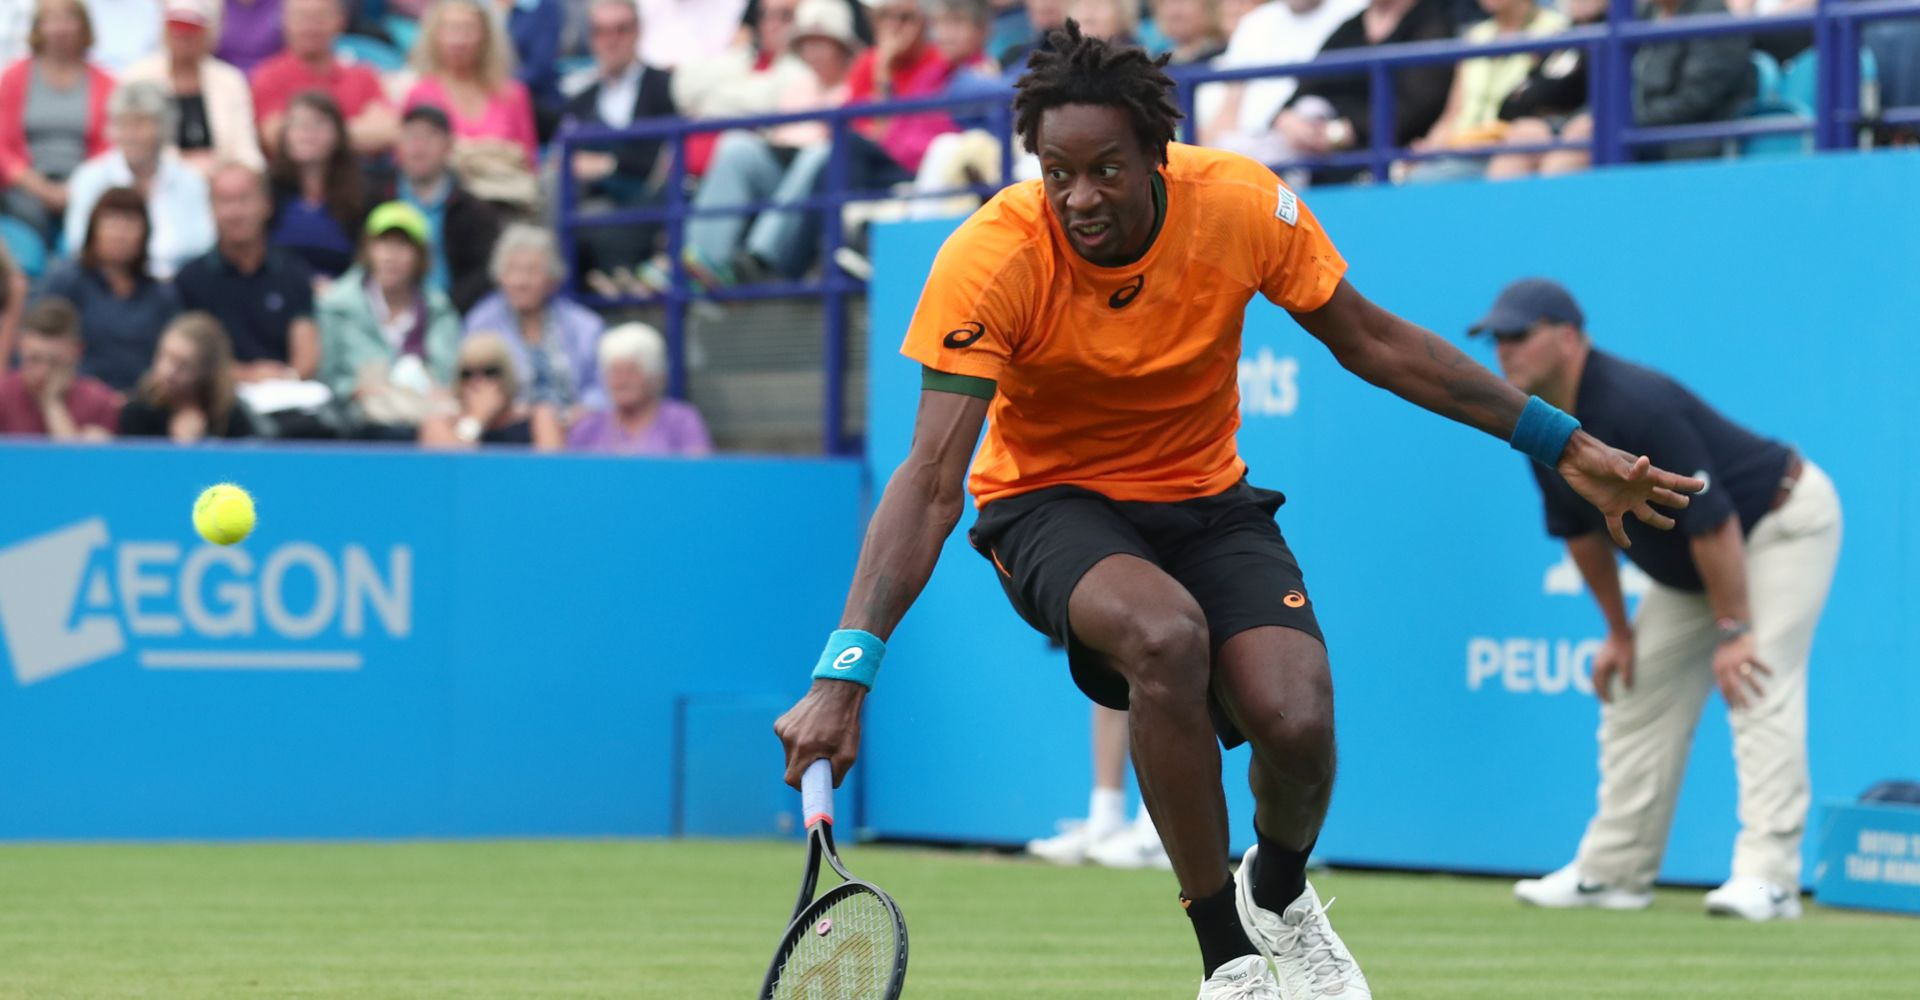 Wimbledon 2018 odds: Monfils' being part of a five-setter is a 21/10 shot among the day five best bets